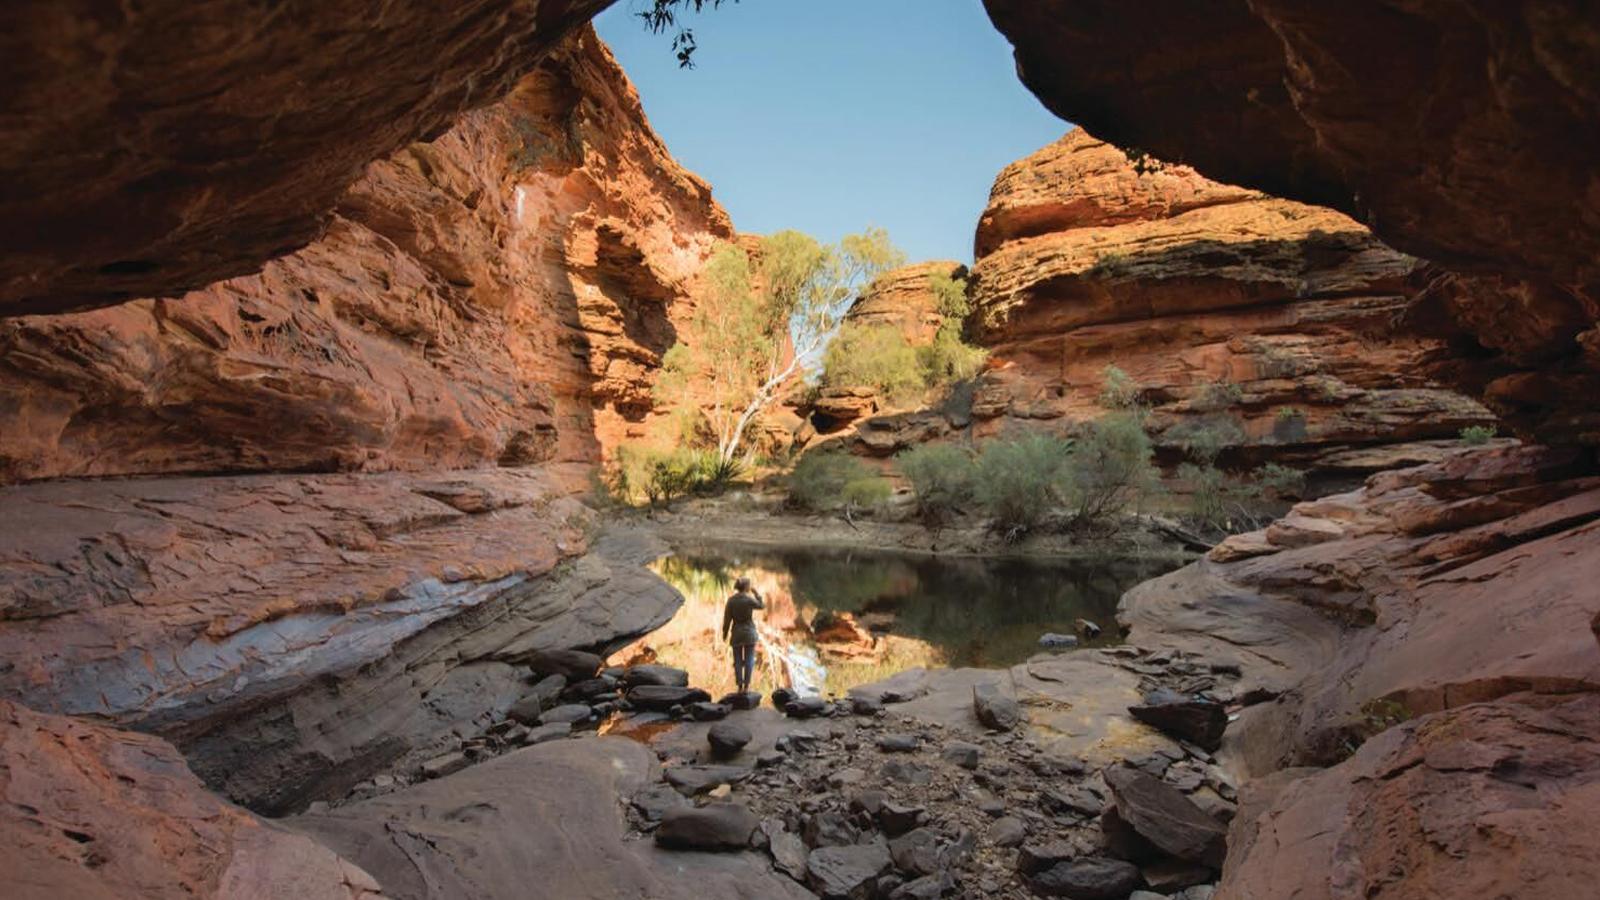 Kings Canyon Australien Reisen für junge Leute traveljunkies